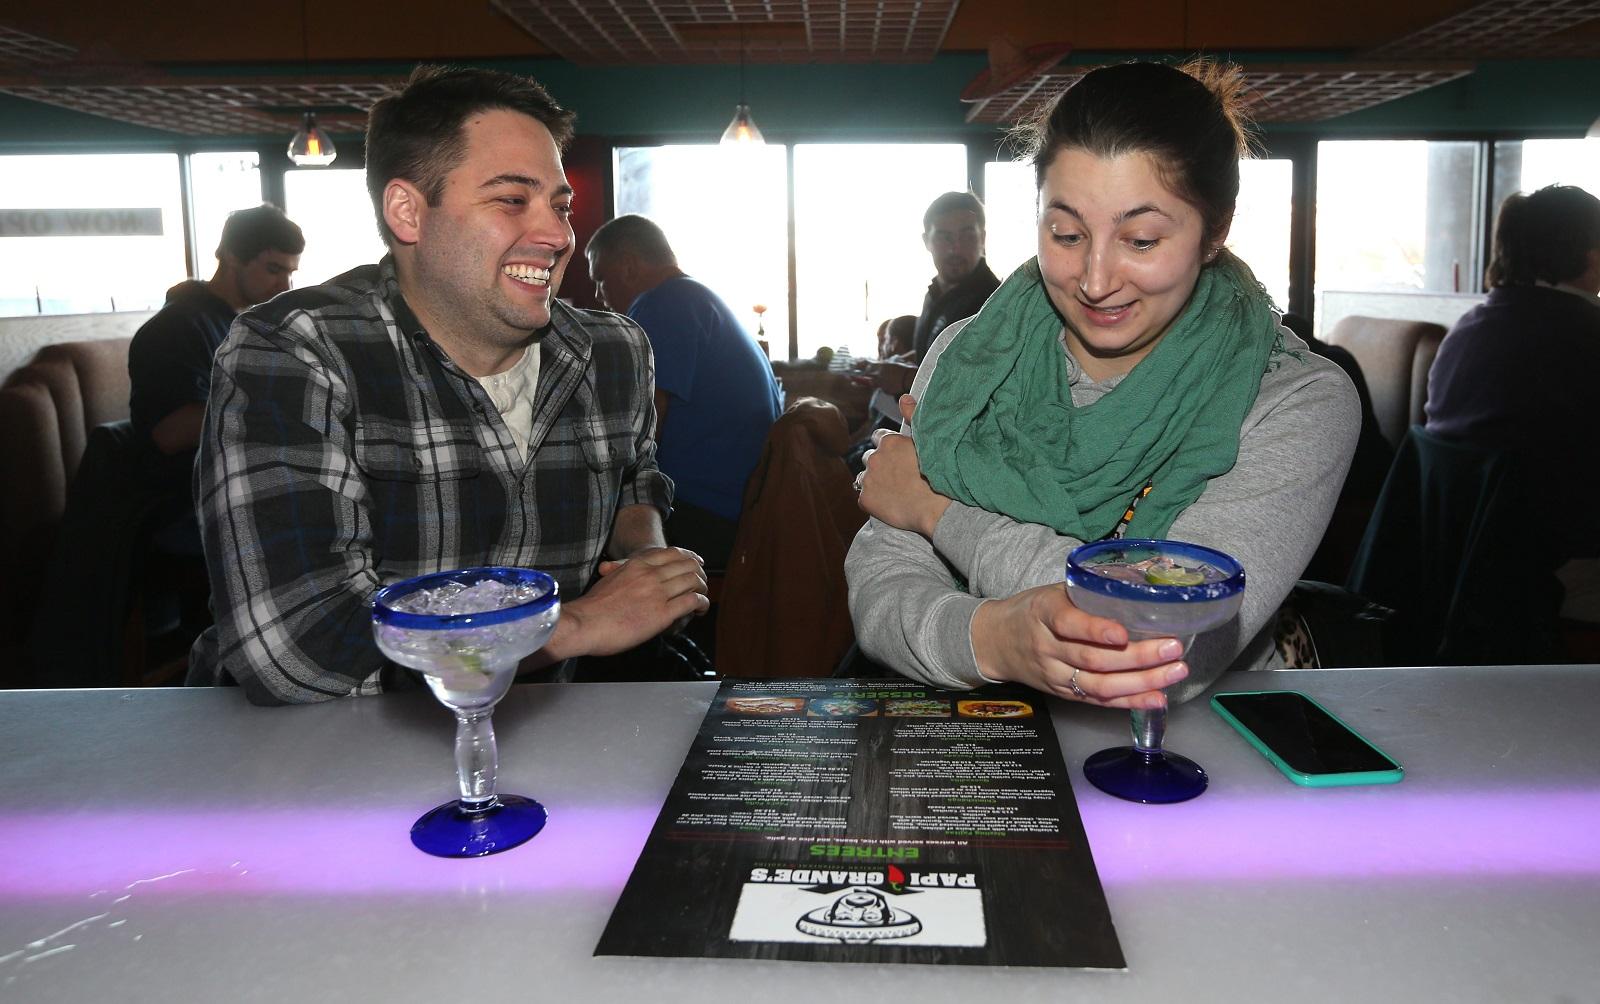 Josh Keller, left, and Jamie Szymanski of the Town of Tonawanda, enjoy a couple of margaritas. (Sharon Cantillon/Buffalo News)